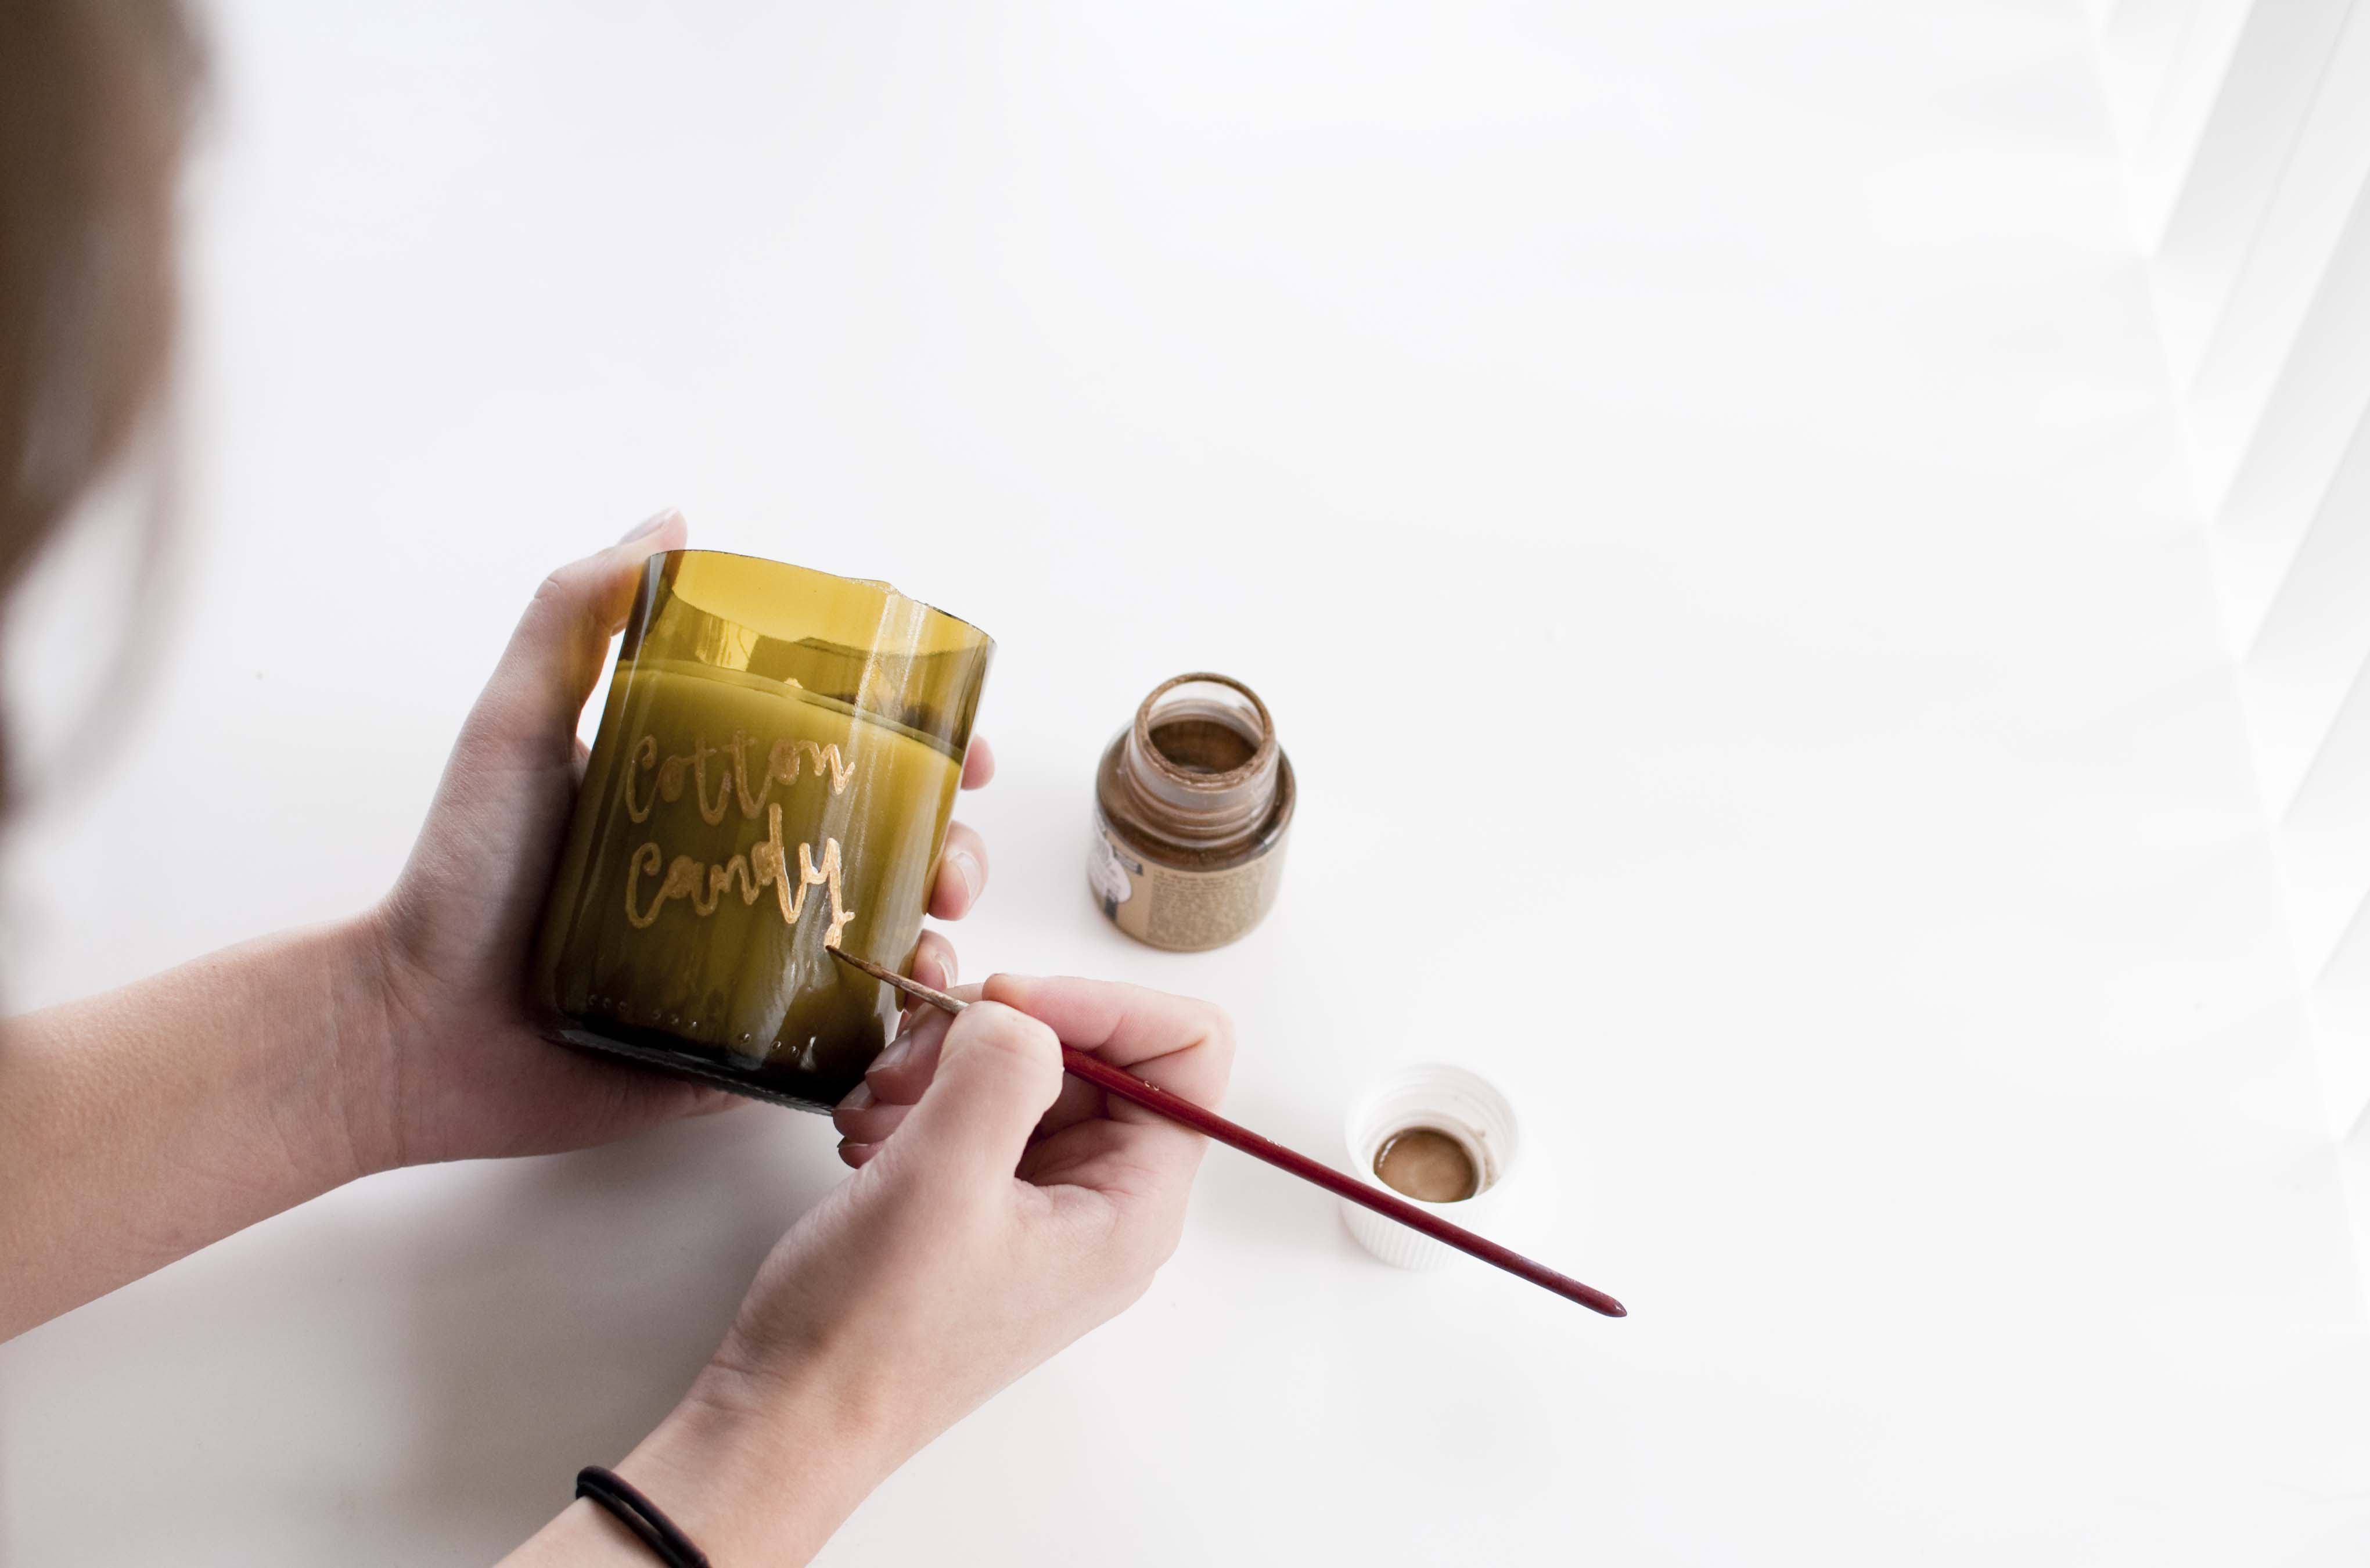 zolea-geurkaarsen-proces-eco-kaars-candle-soy